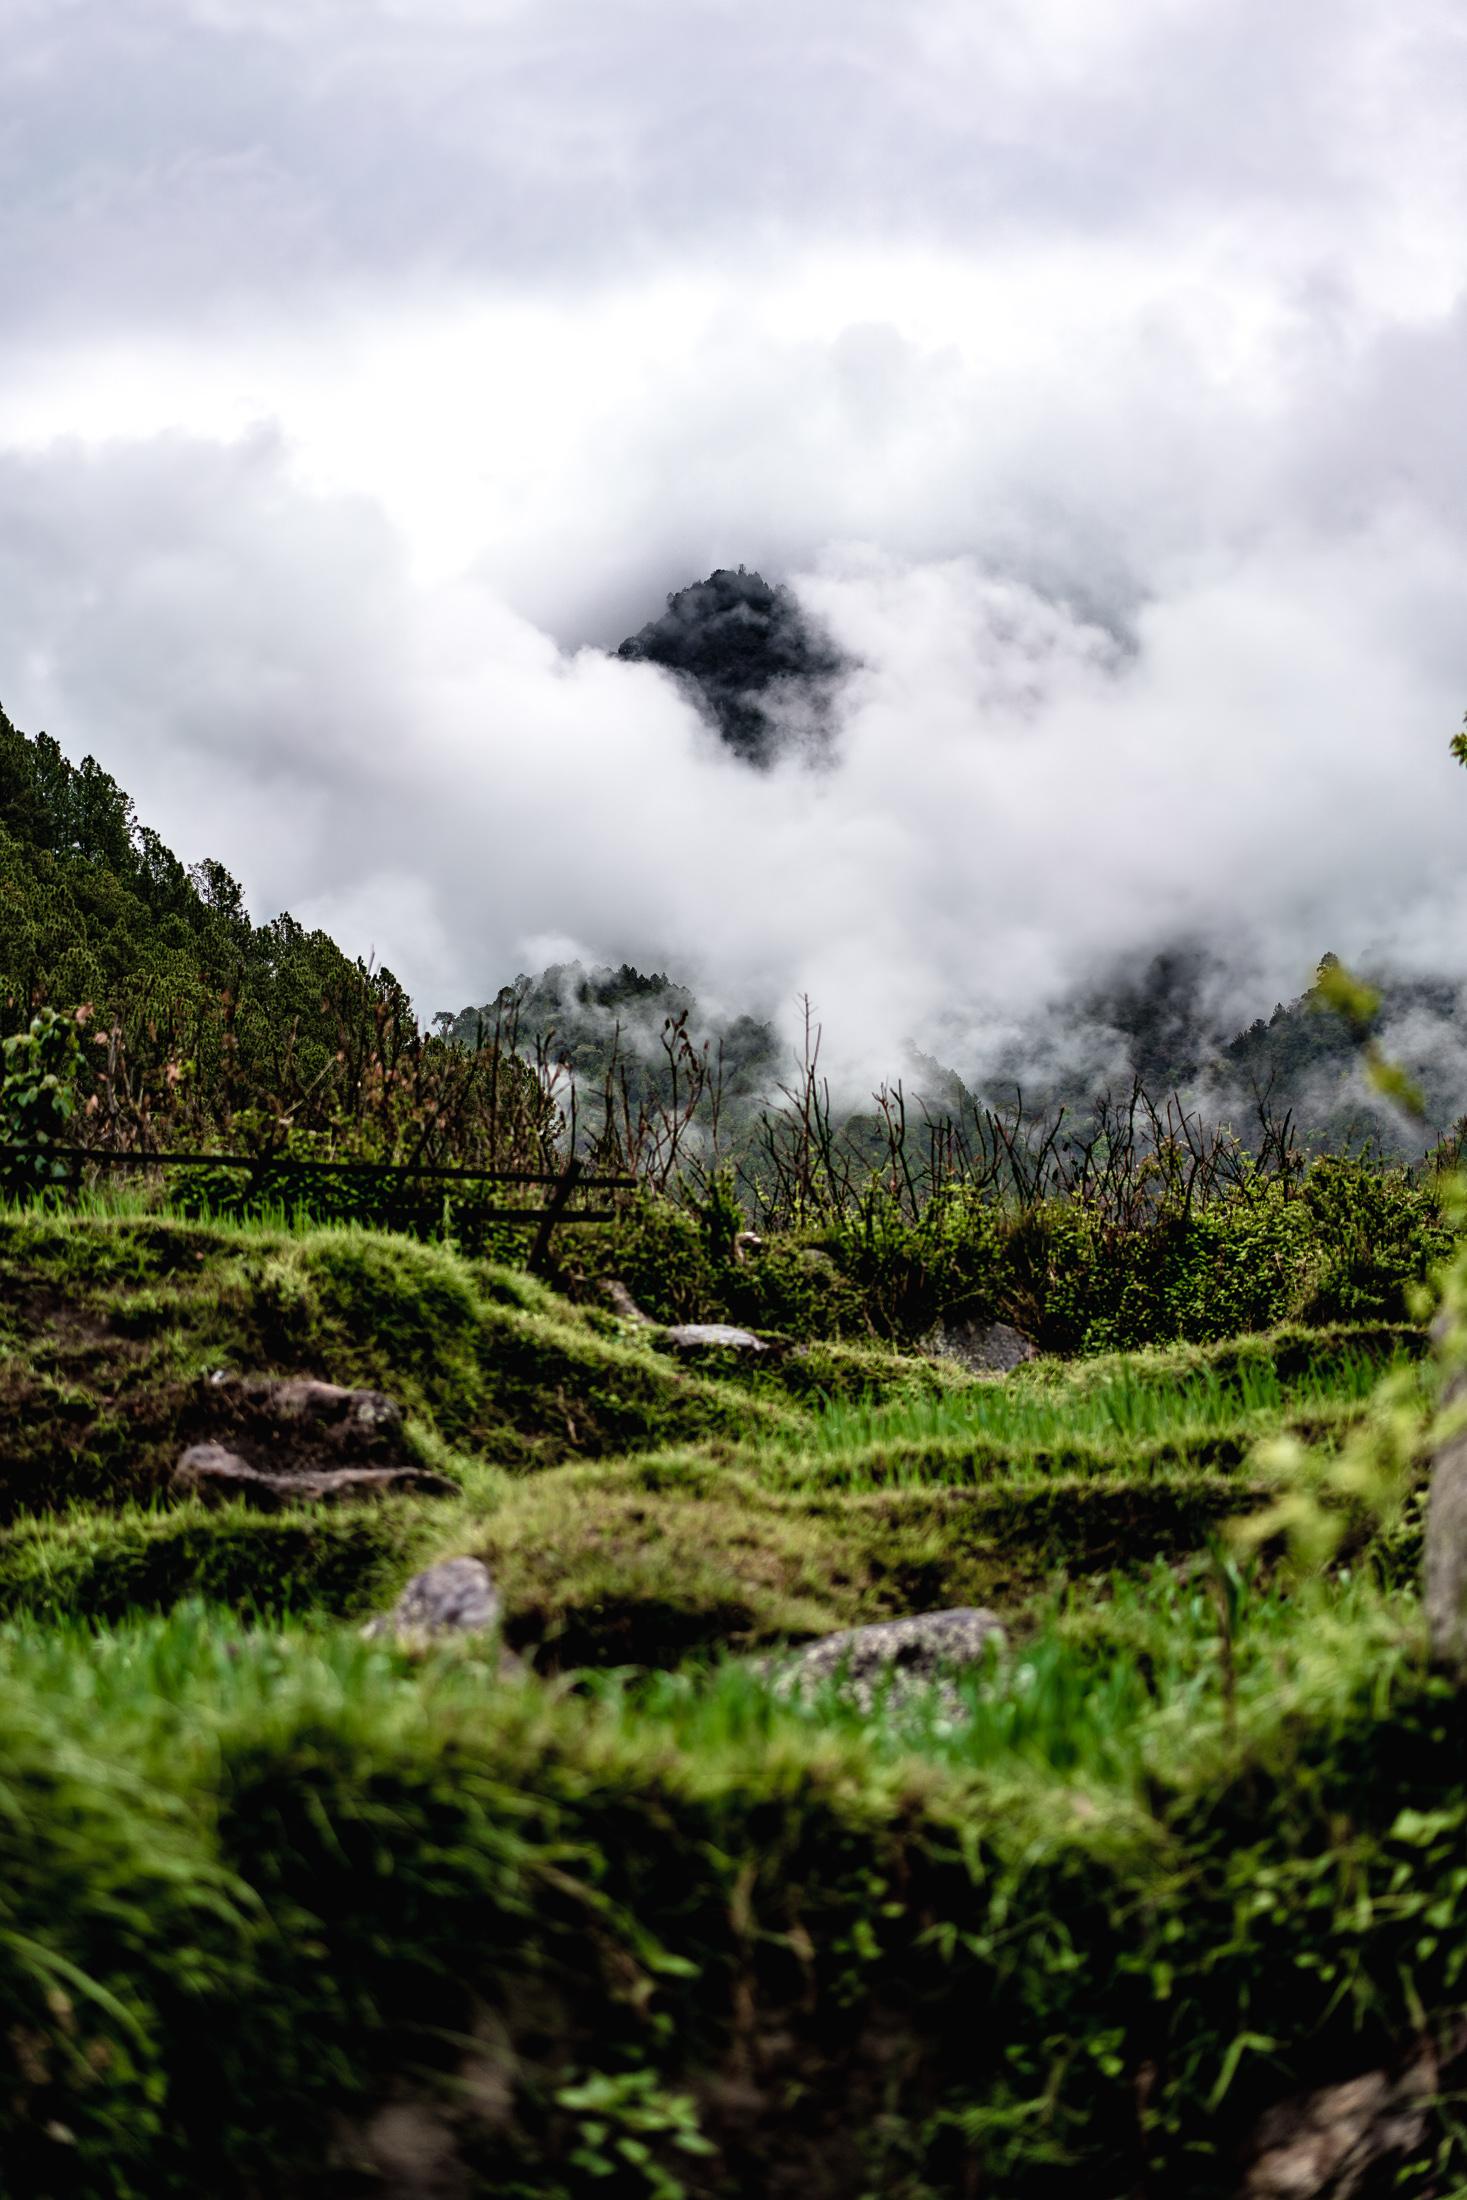 2019.04.07_LHO Bhutan_8264_2200px.jpg